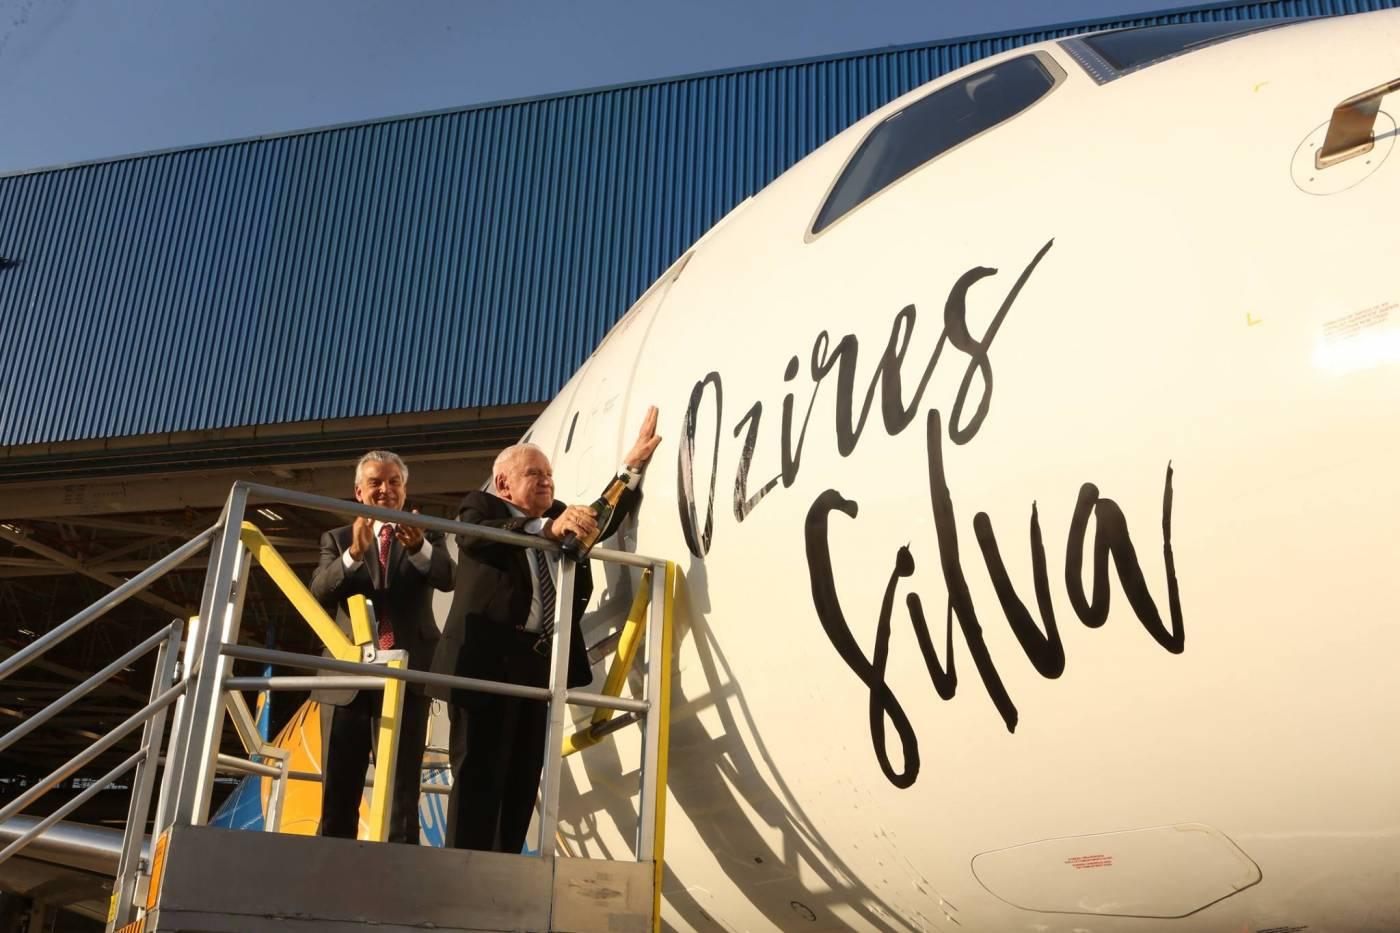 Boeing mostra interesse em comprar Embraer, afirma jornal norte-americano